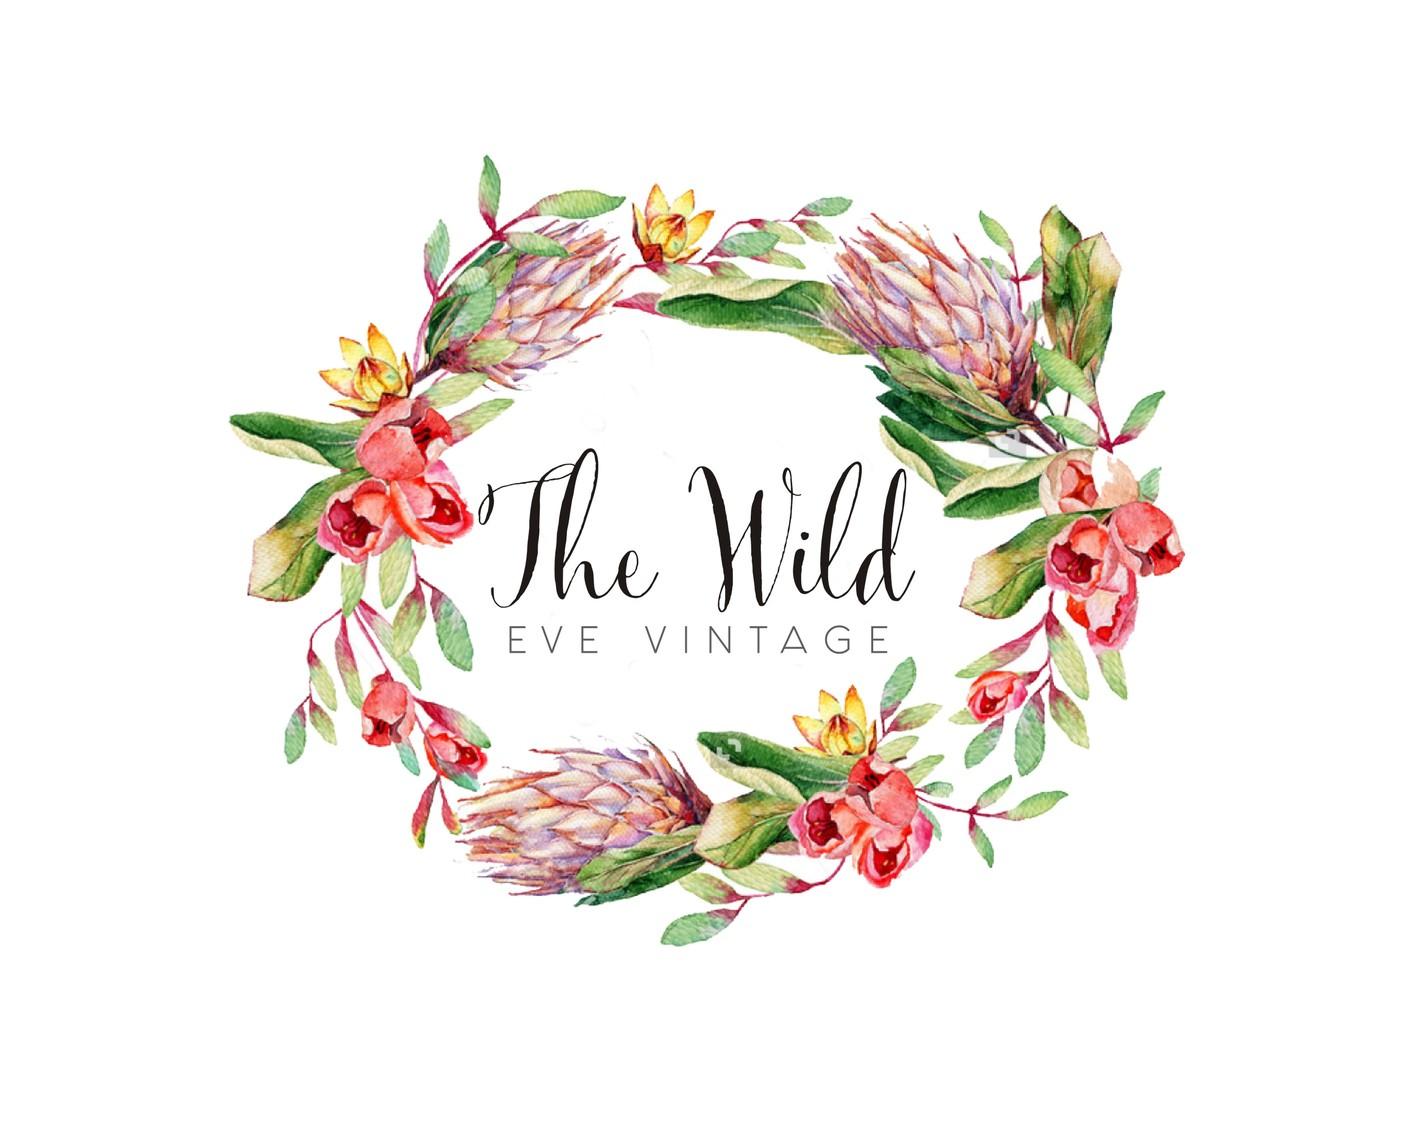 The-Wild-Eve-Vintage